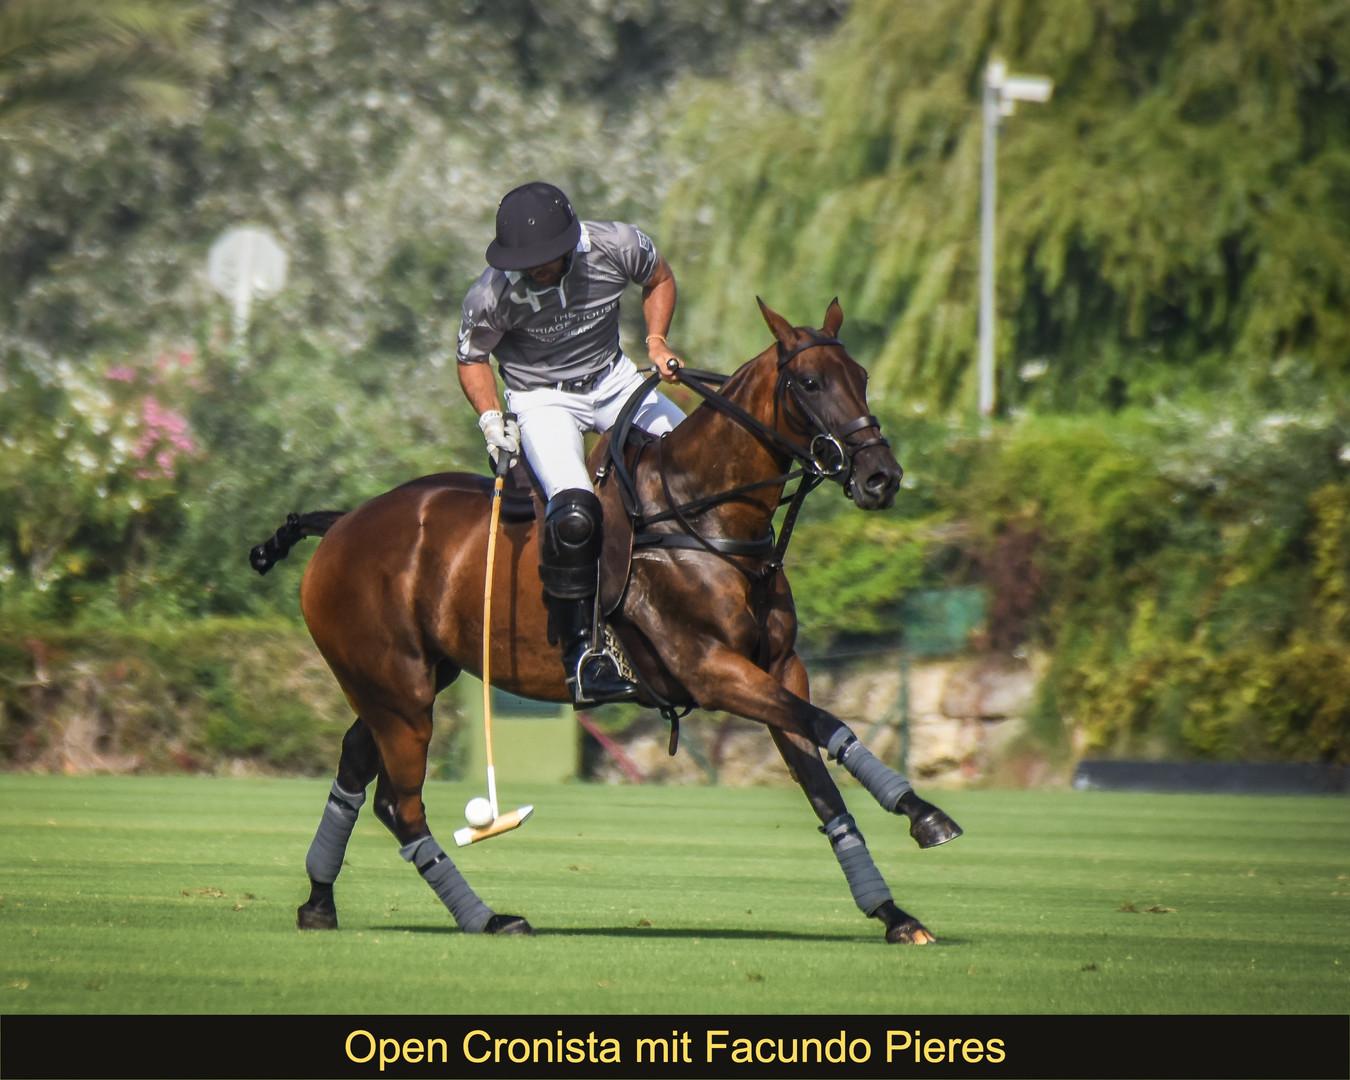 Open Cronista